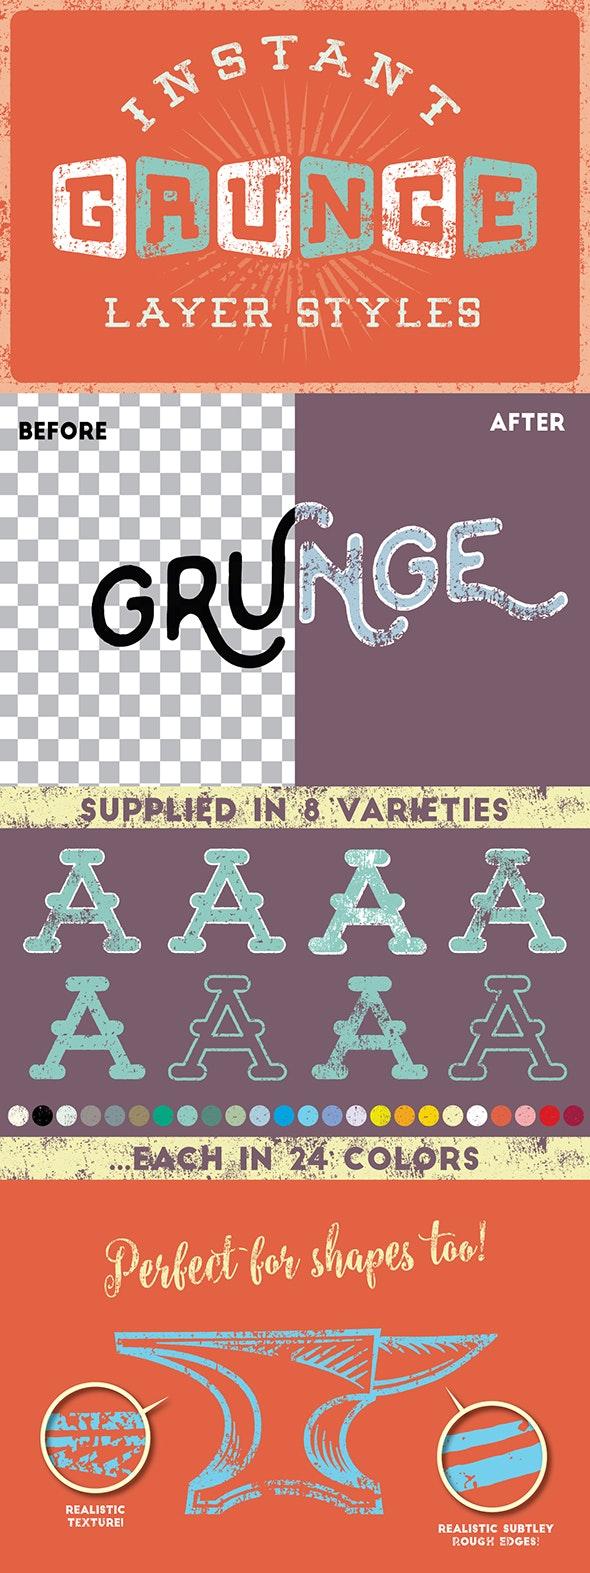 Grunge Layer Styles - Styles Illustrator